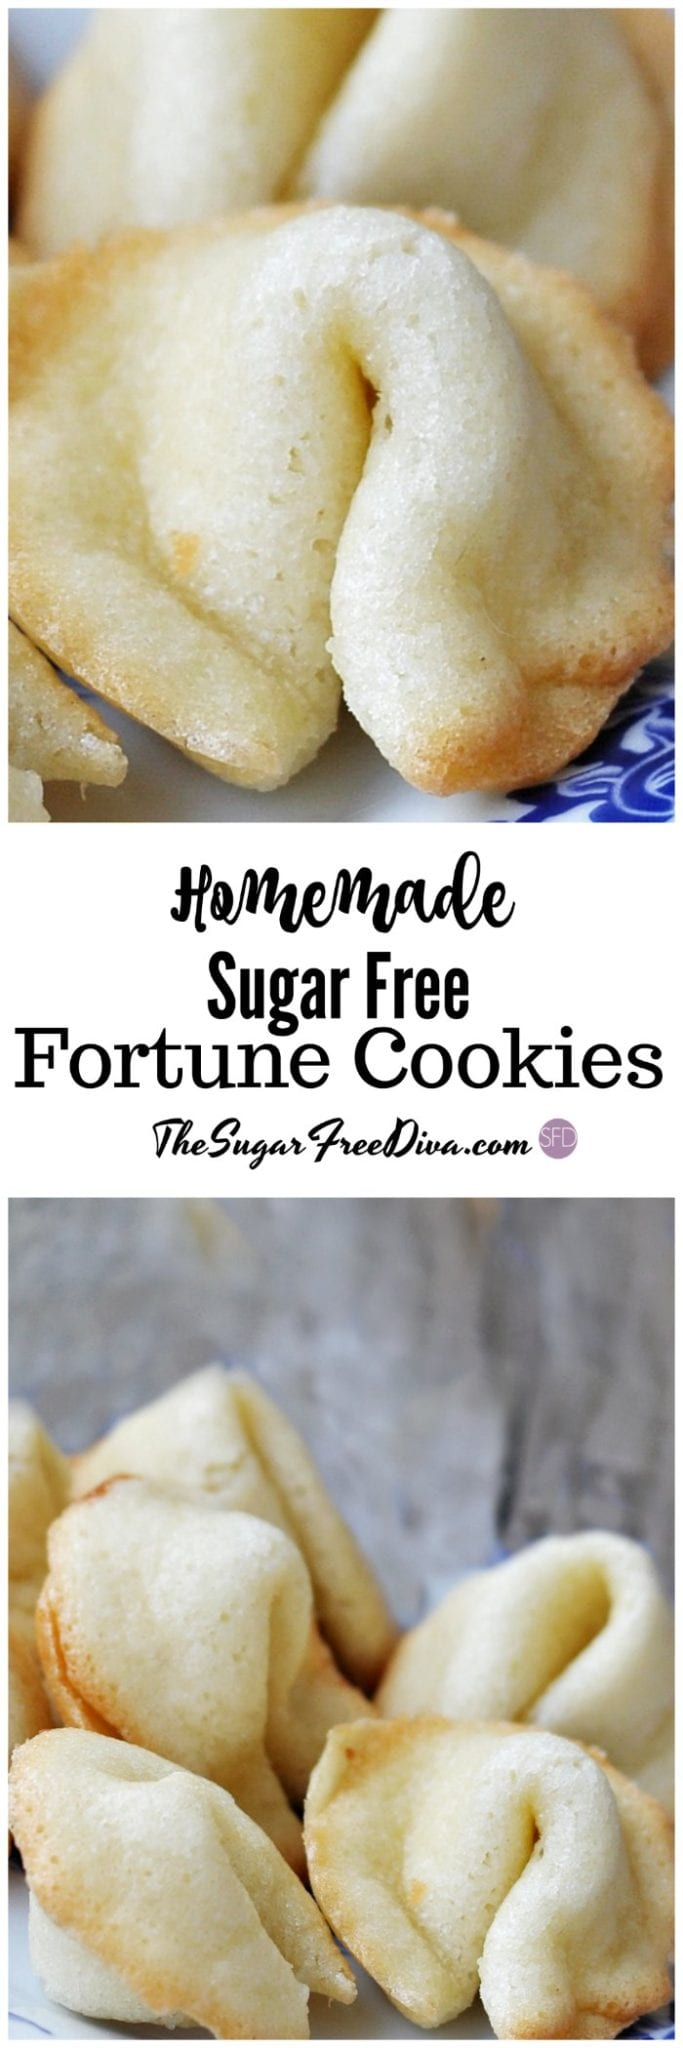 Homemade Sugar Free Fortune Cookies